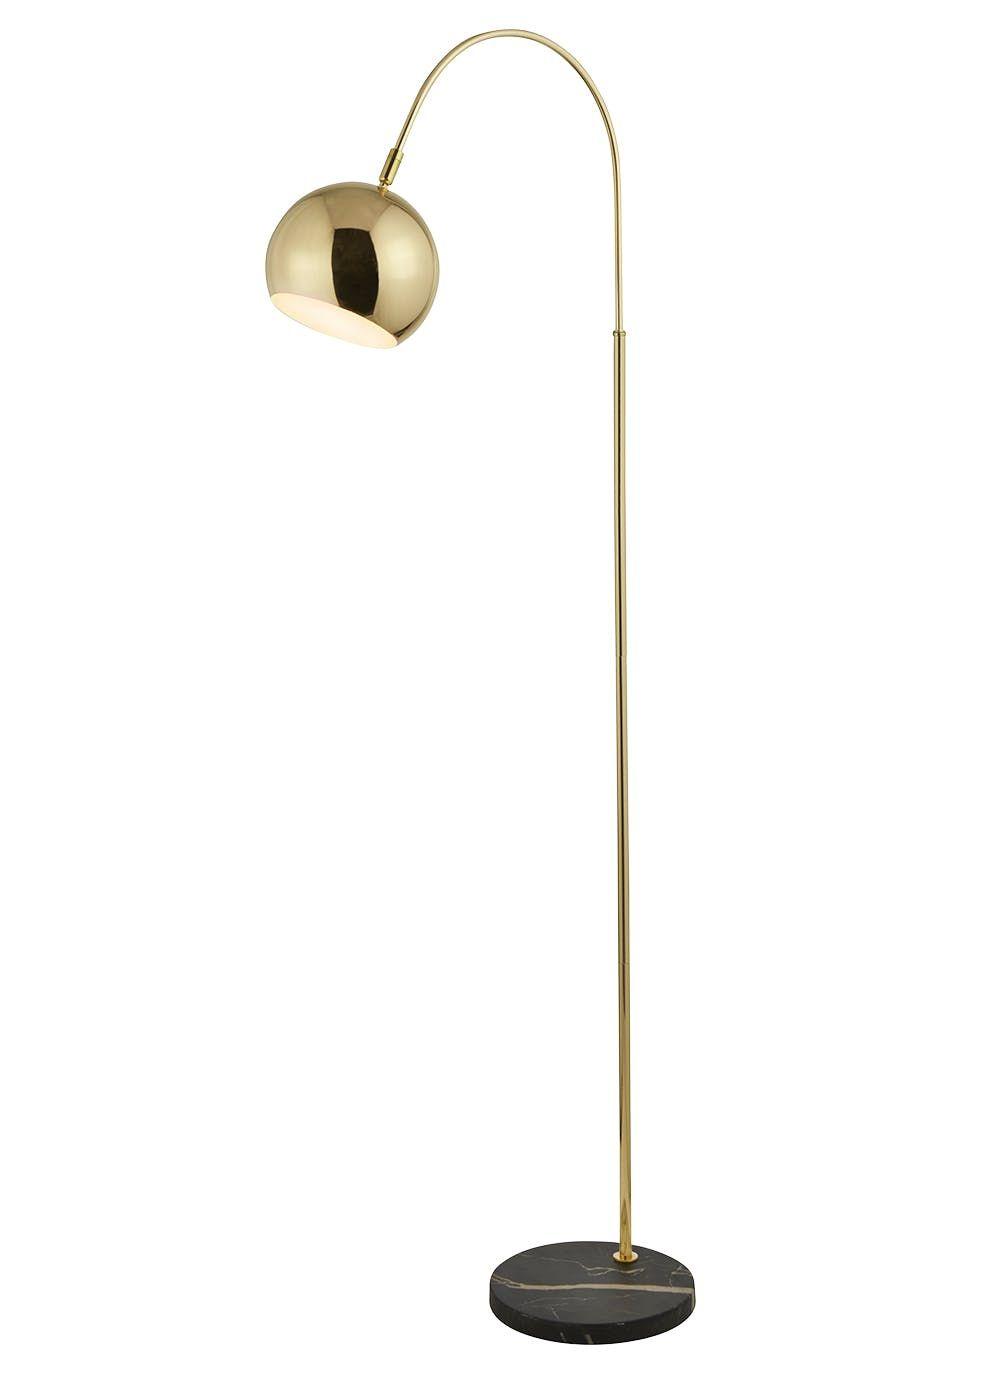 Alana marble base floor lamp h140cm x w24cm gold in